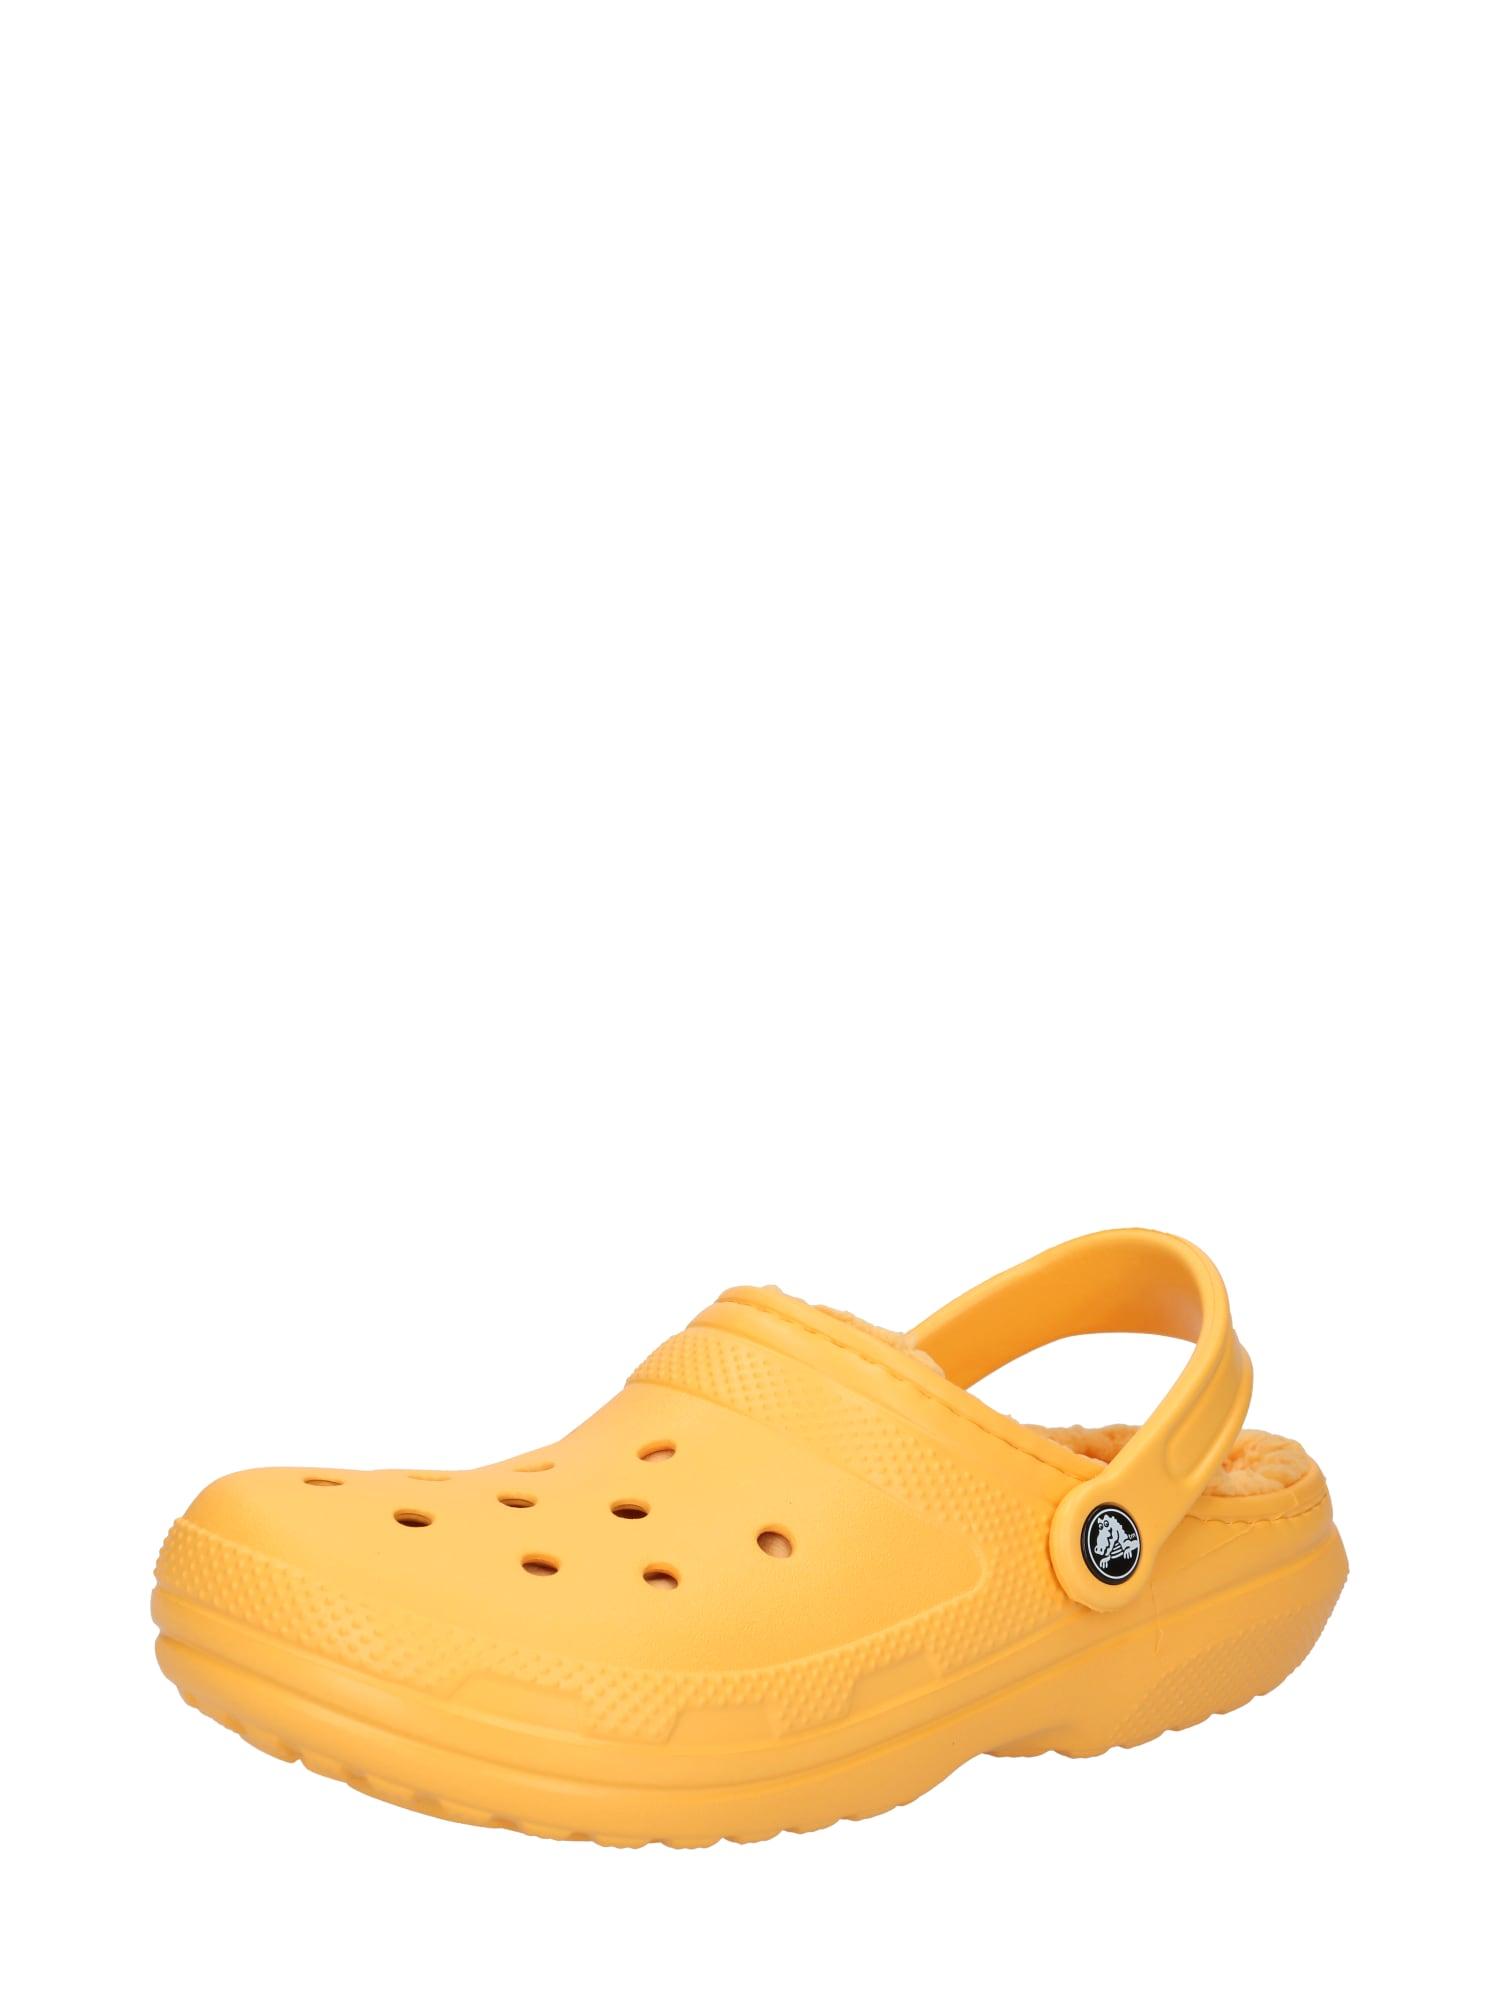 Crocs Sabots  - Orange - Taille: M4W6 - male